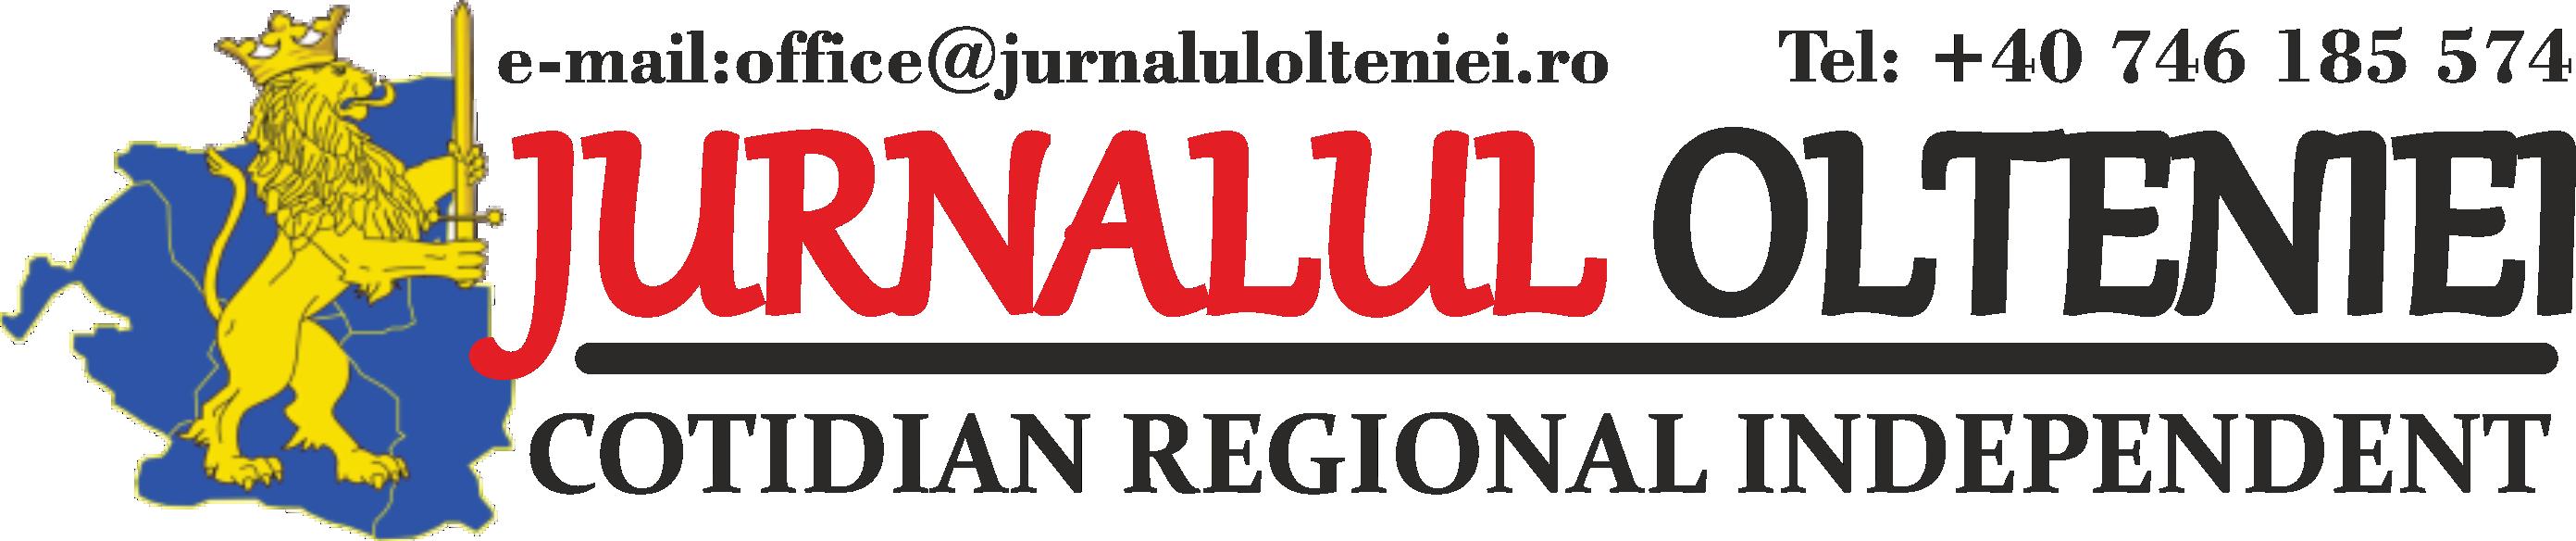 Stiri regionale Oltenia – Jurnalul Olteniei